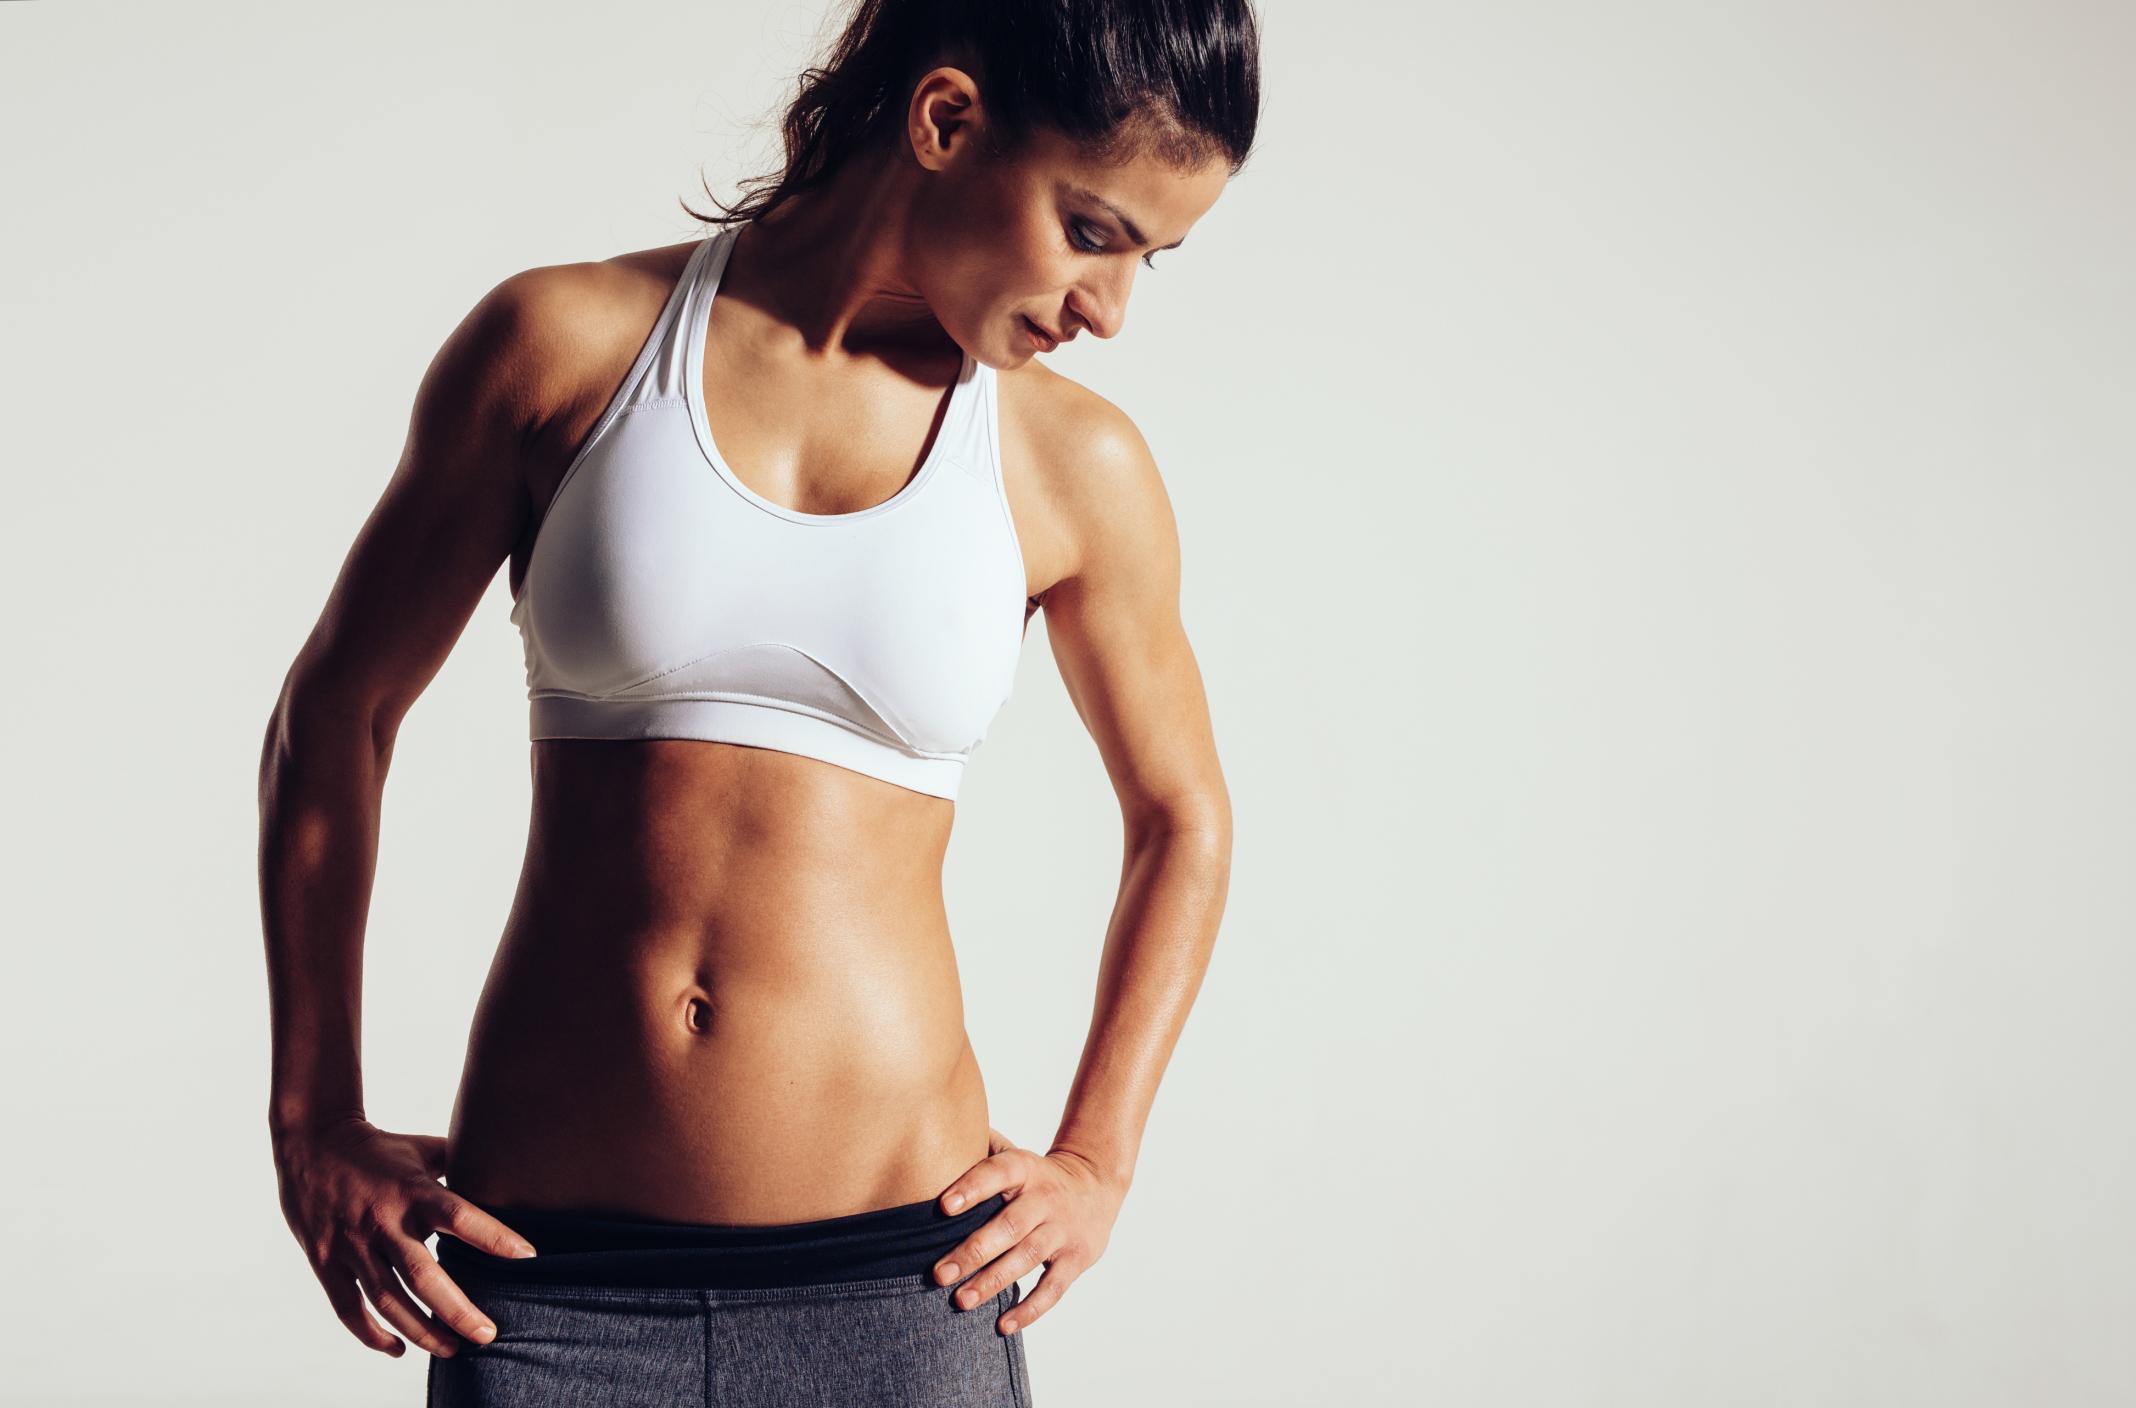 Should You Wear an Abdominal Sweatband